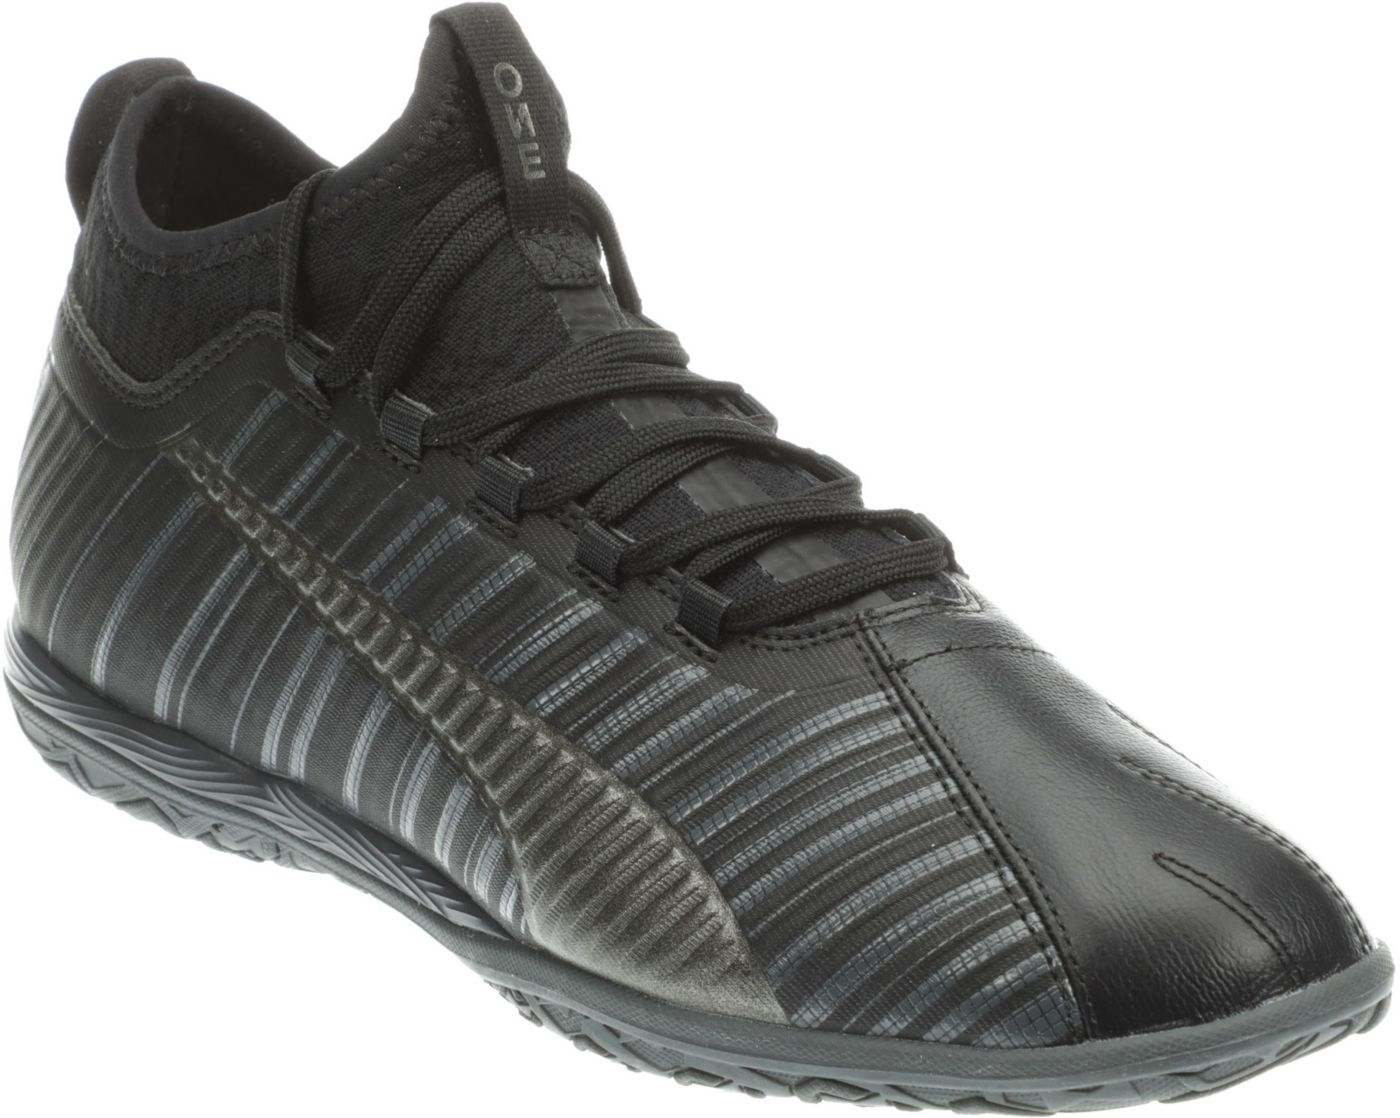 PUMA Men's ONE 5.3 Indoor Soccer Shoes